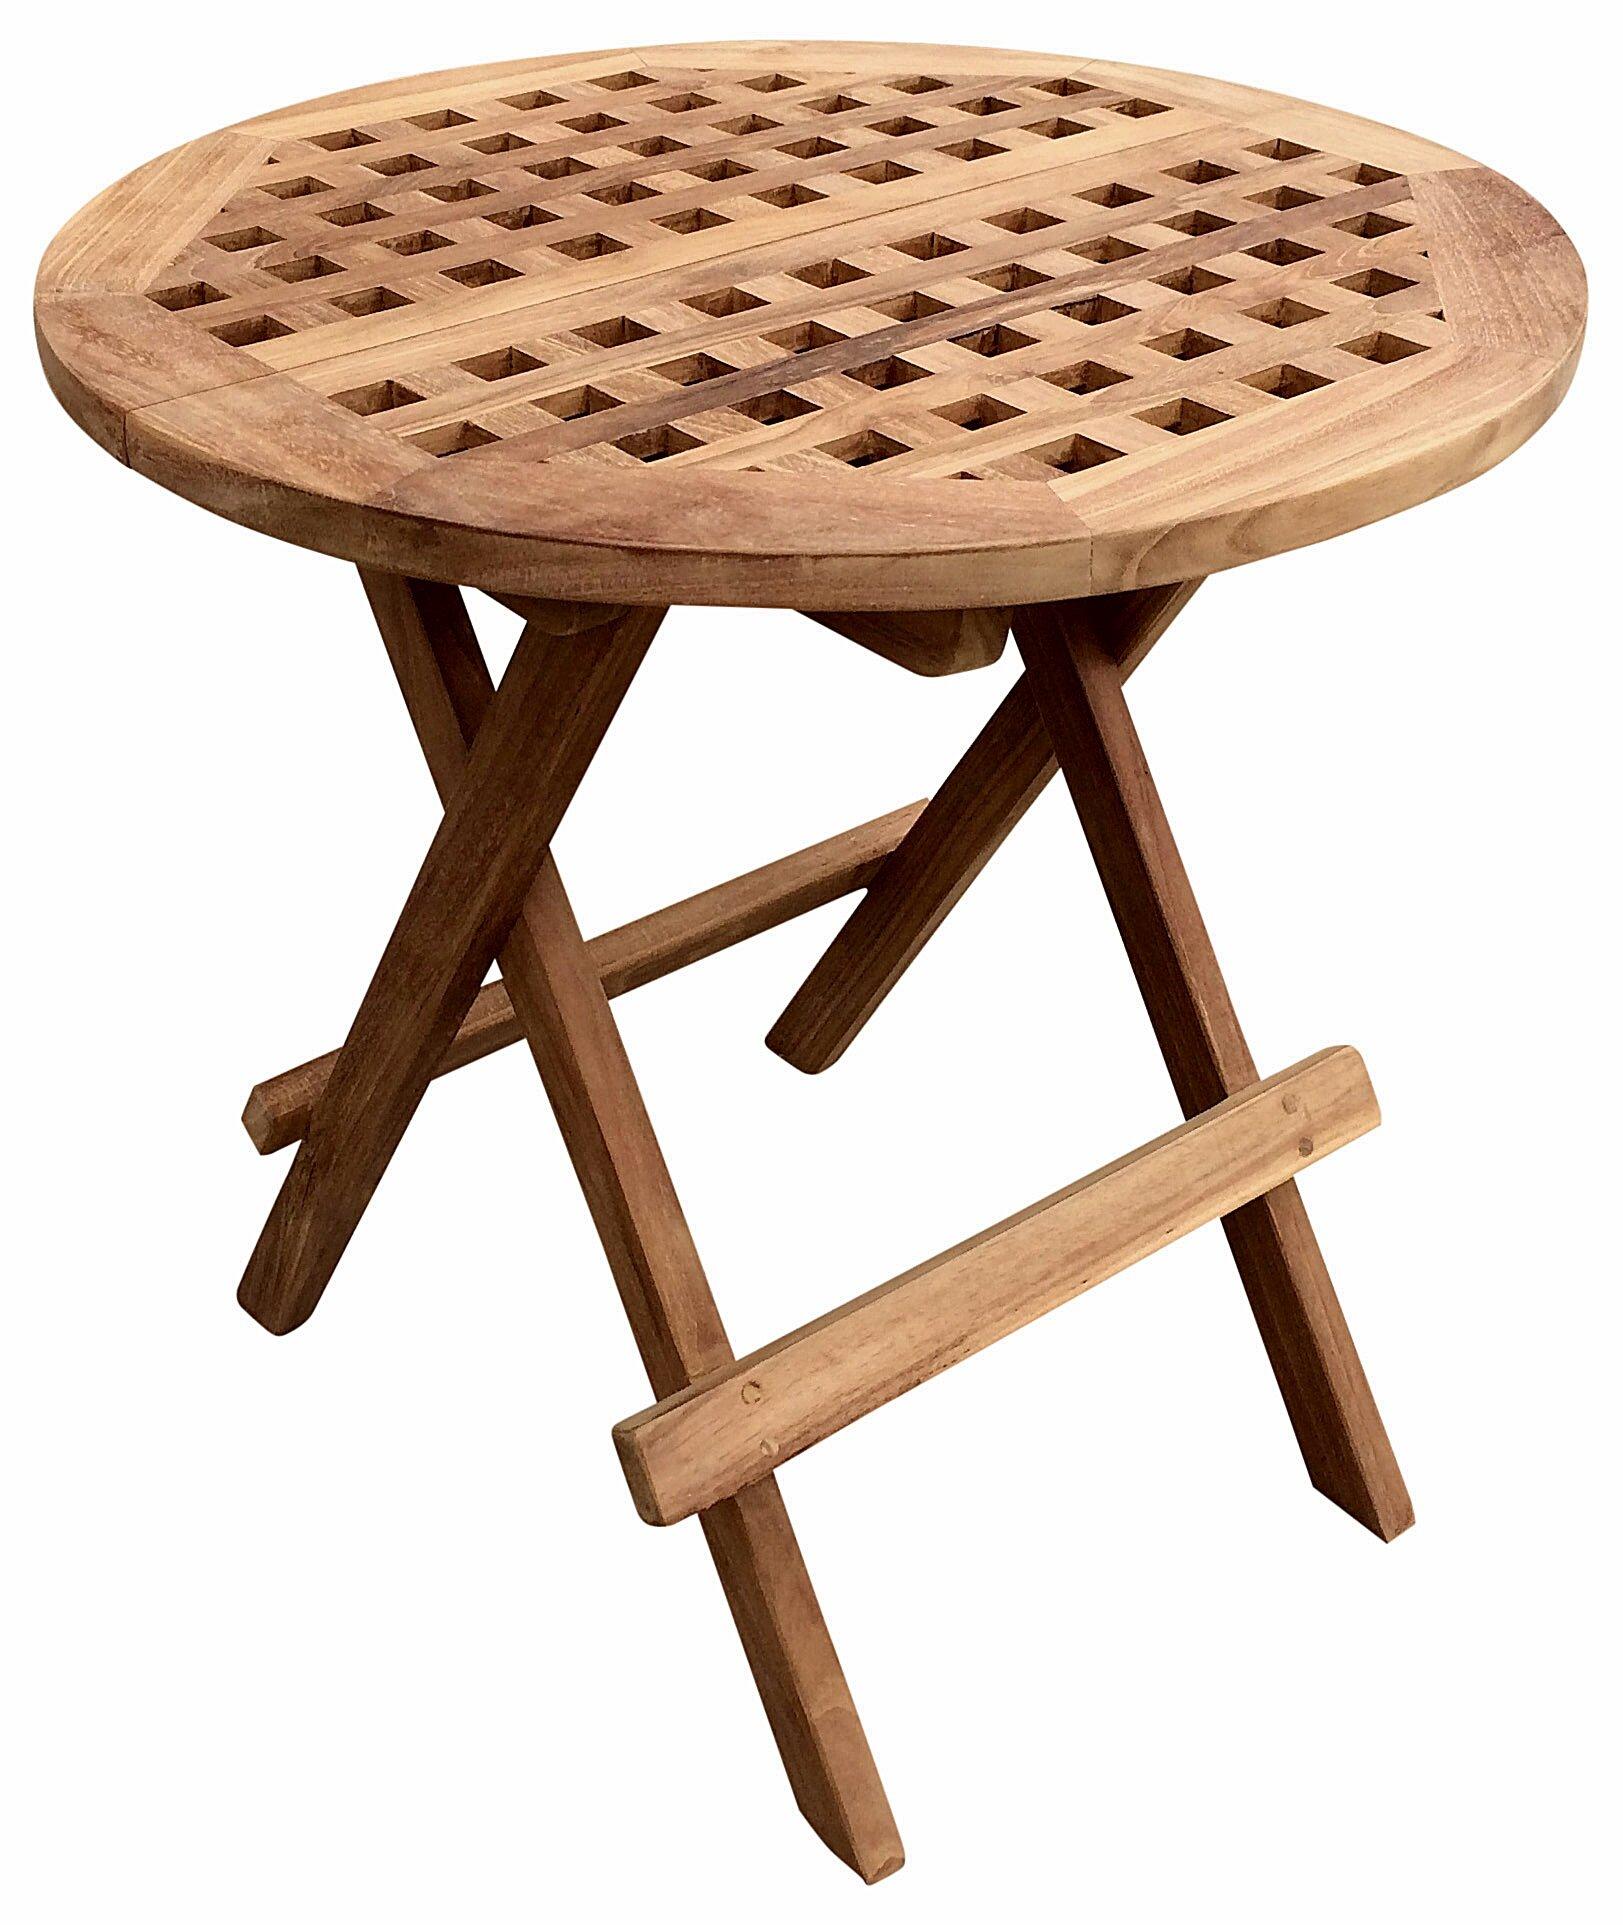 Marvelous Round Teak Folding Picnic Table Download Free Architecture Designs Lectubocepmadebymaigaardcom